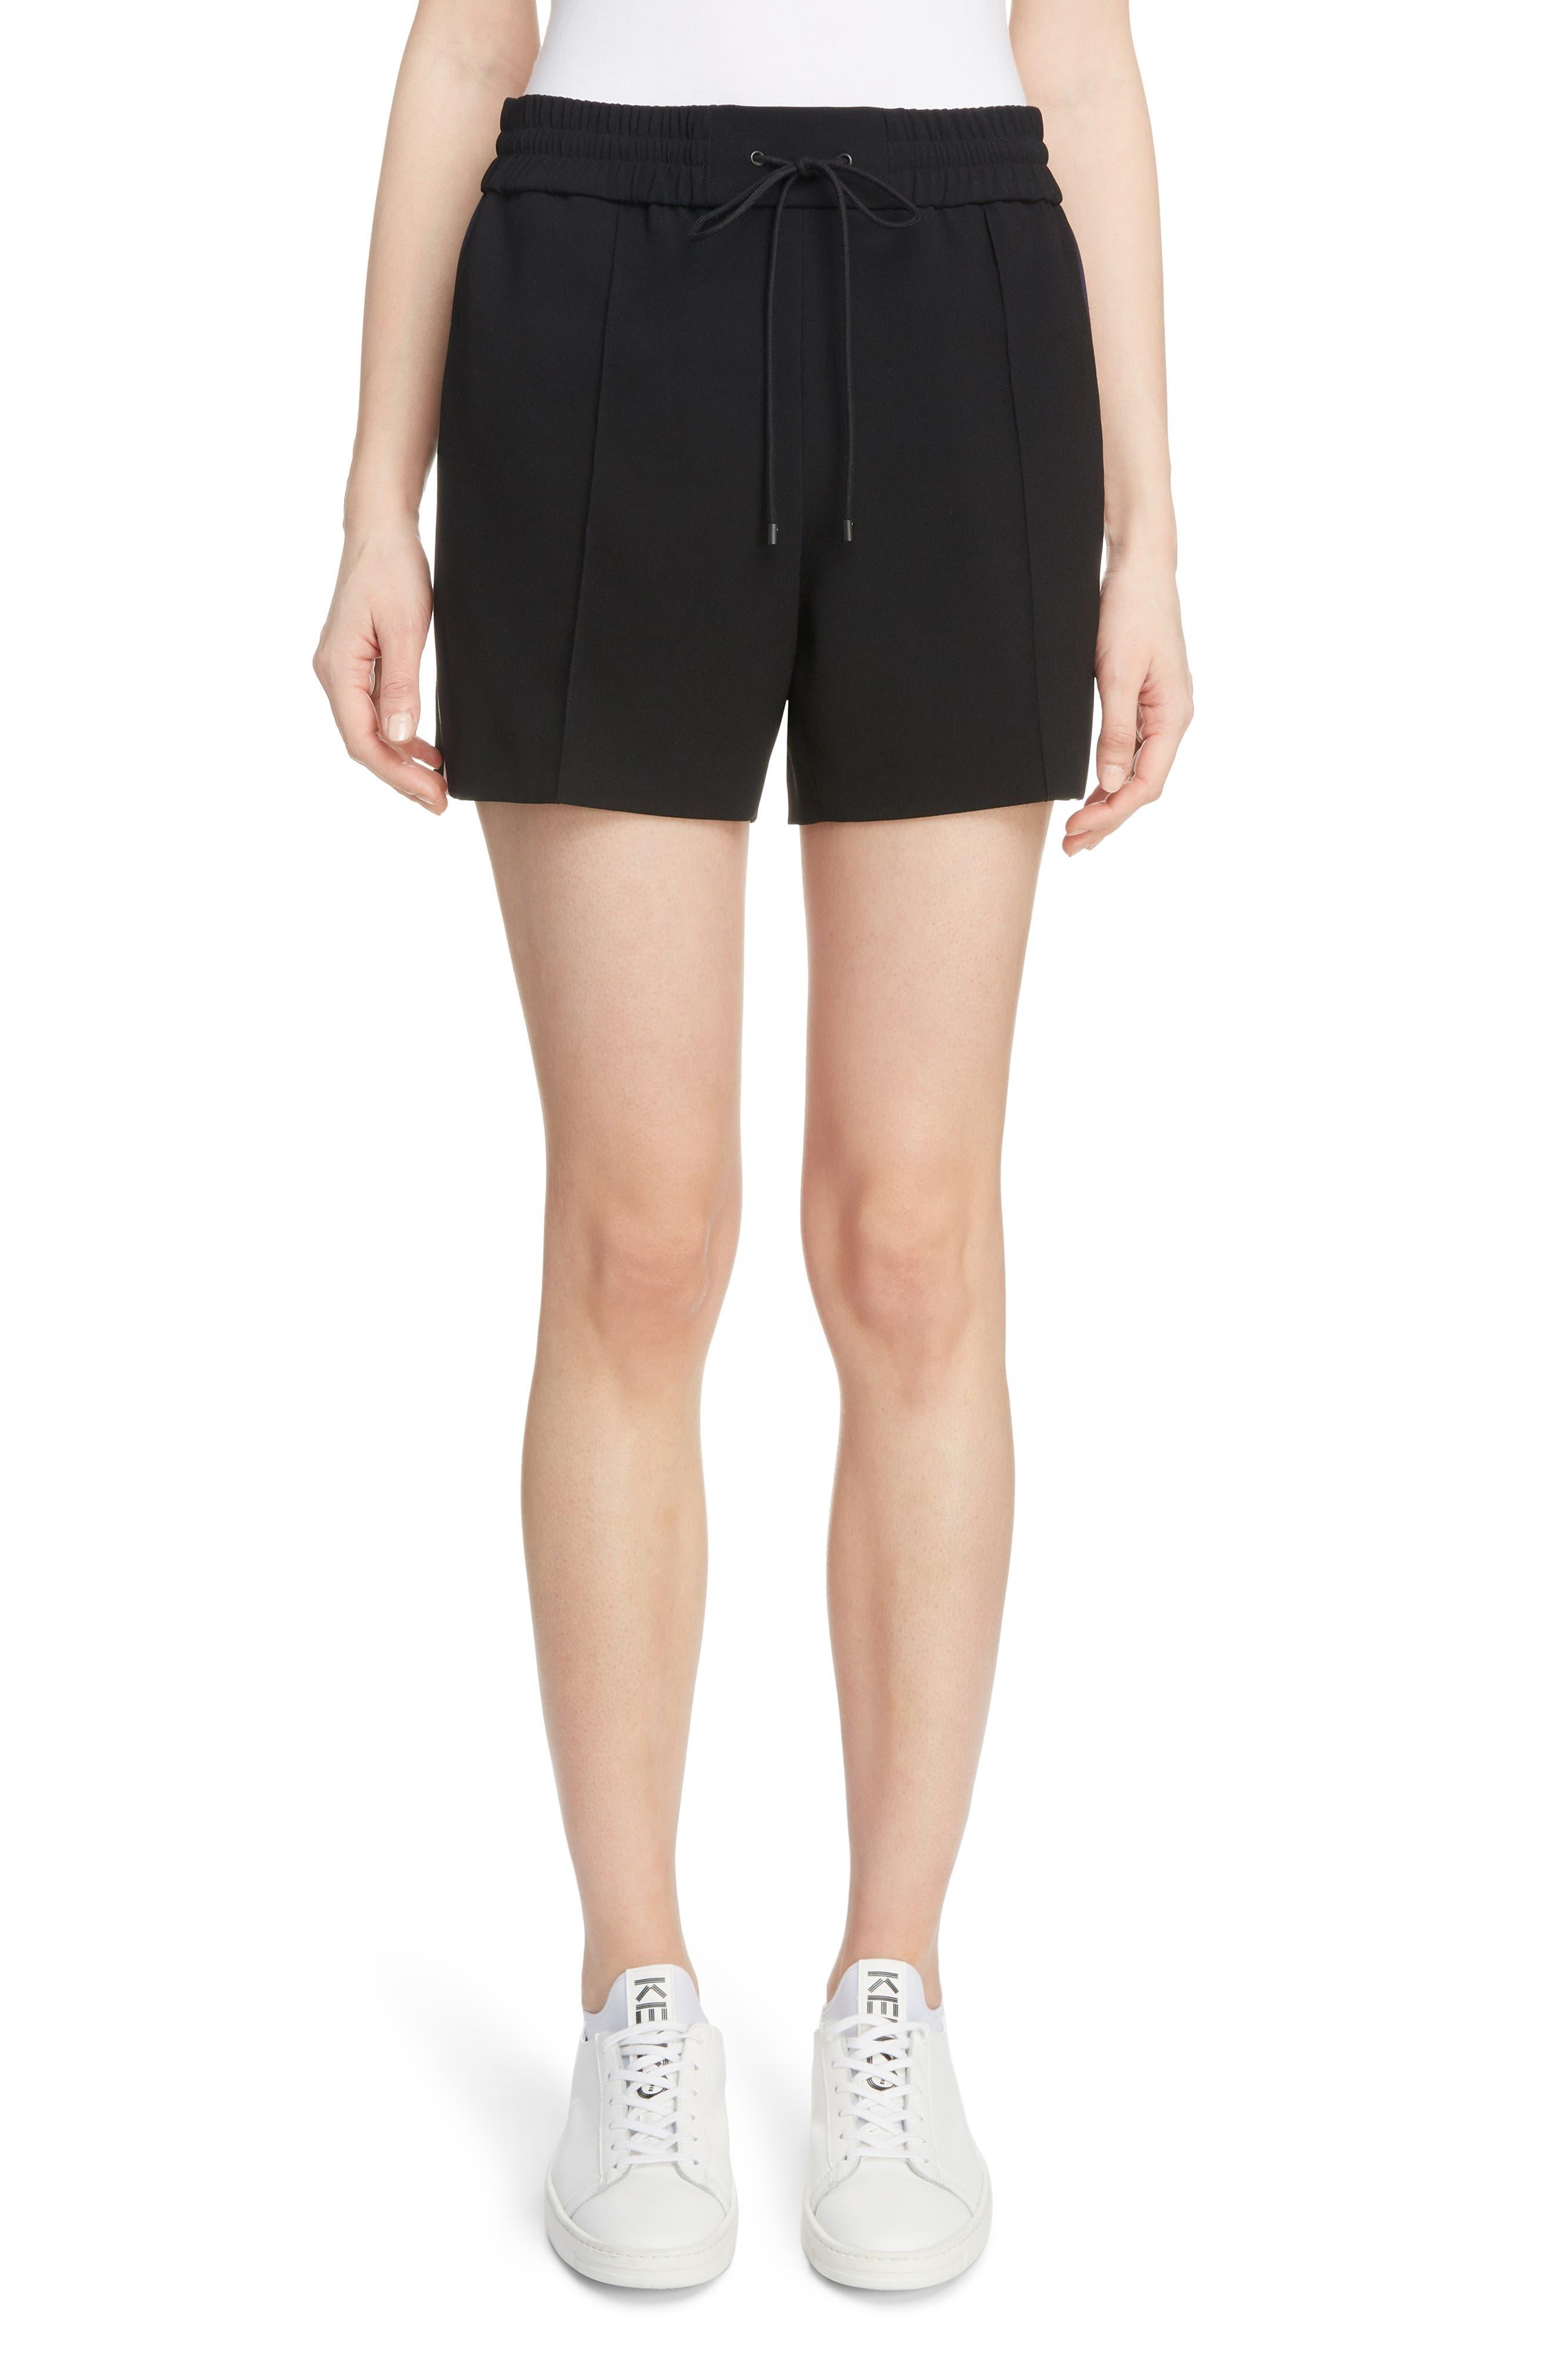 Jogging Shorts,                         Main,                         color, 001